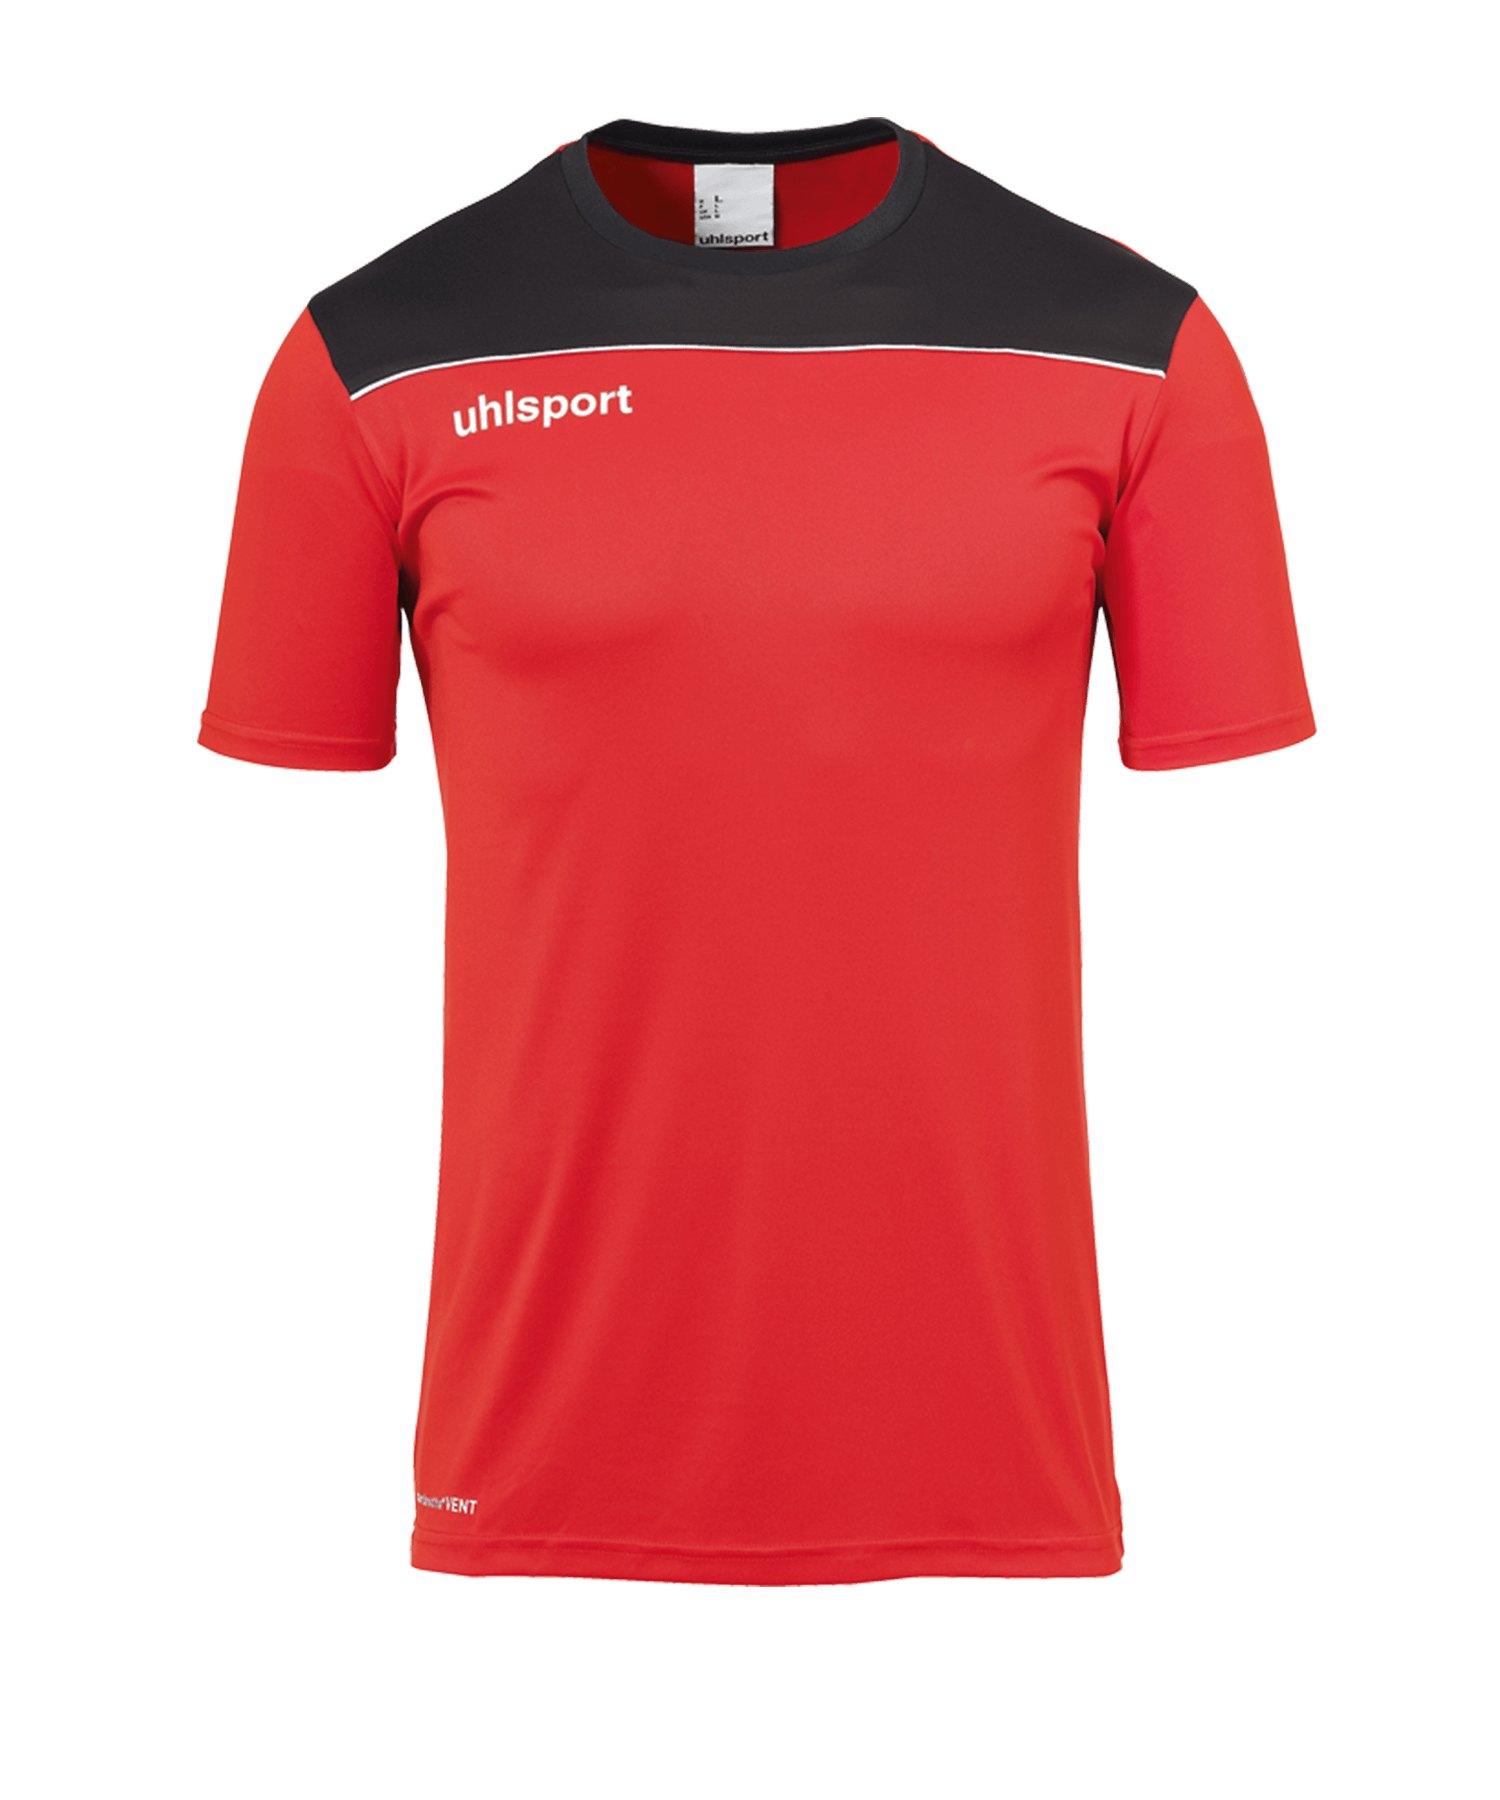 Uhlsport Offense 23 Trainingsshirt Rot Schwarz F04 - rot